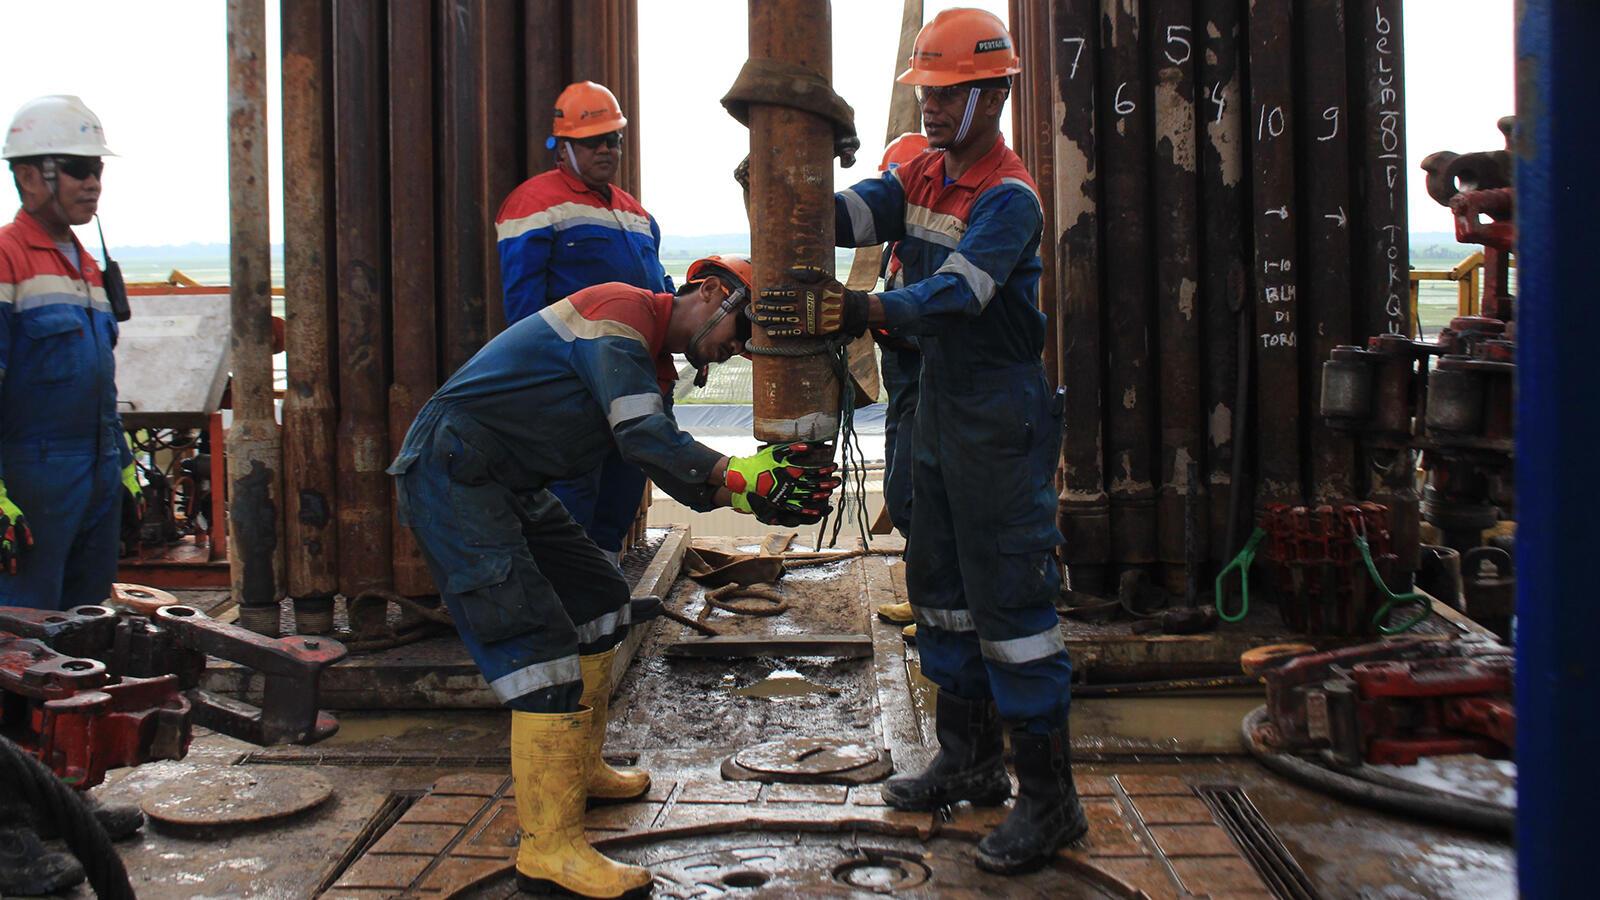 Blok Rokan Pasca 2021: Diserahkan ke Chevron atau Pertamina?